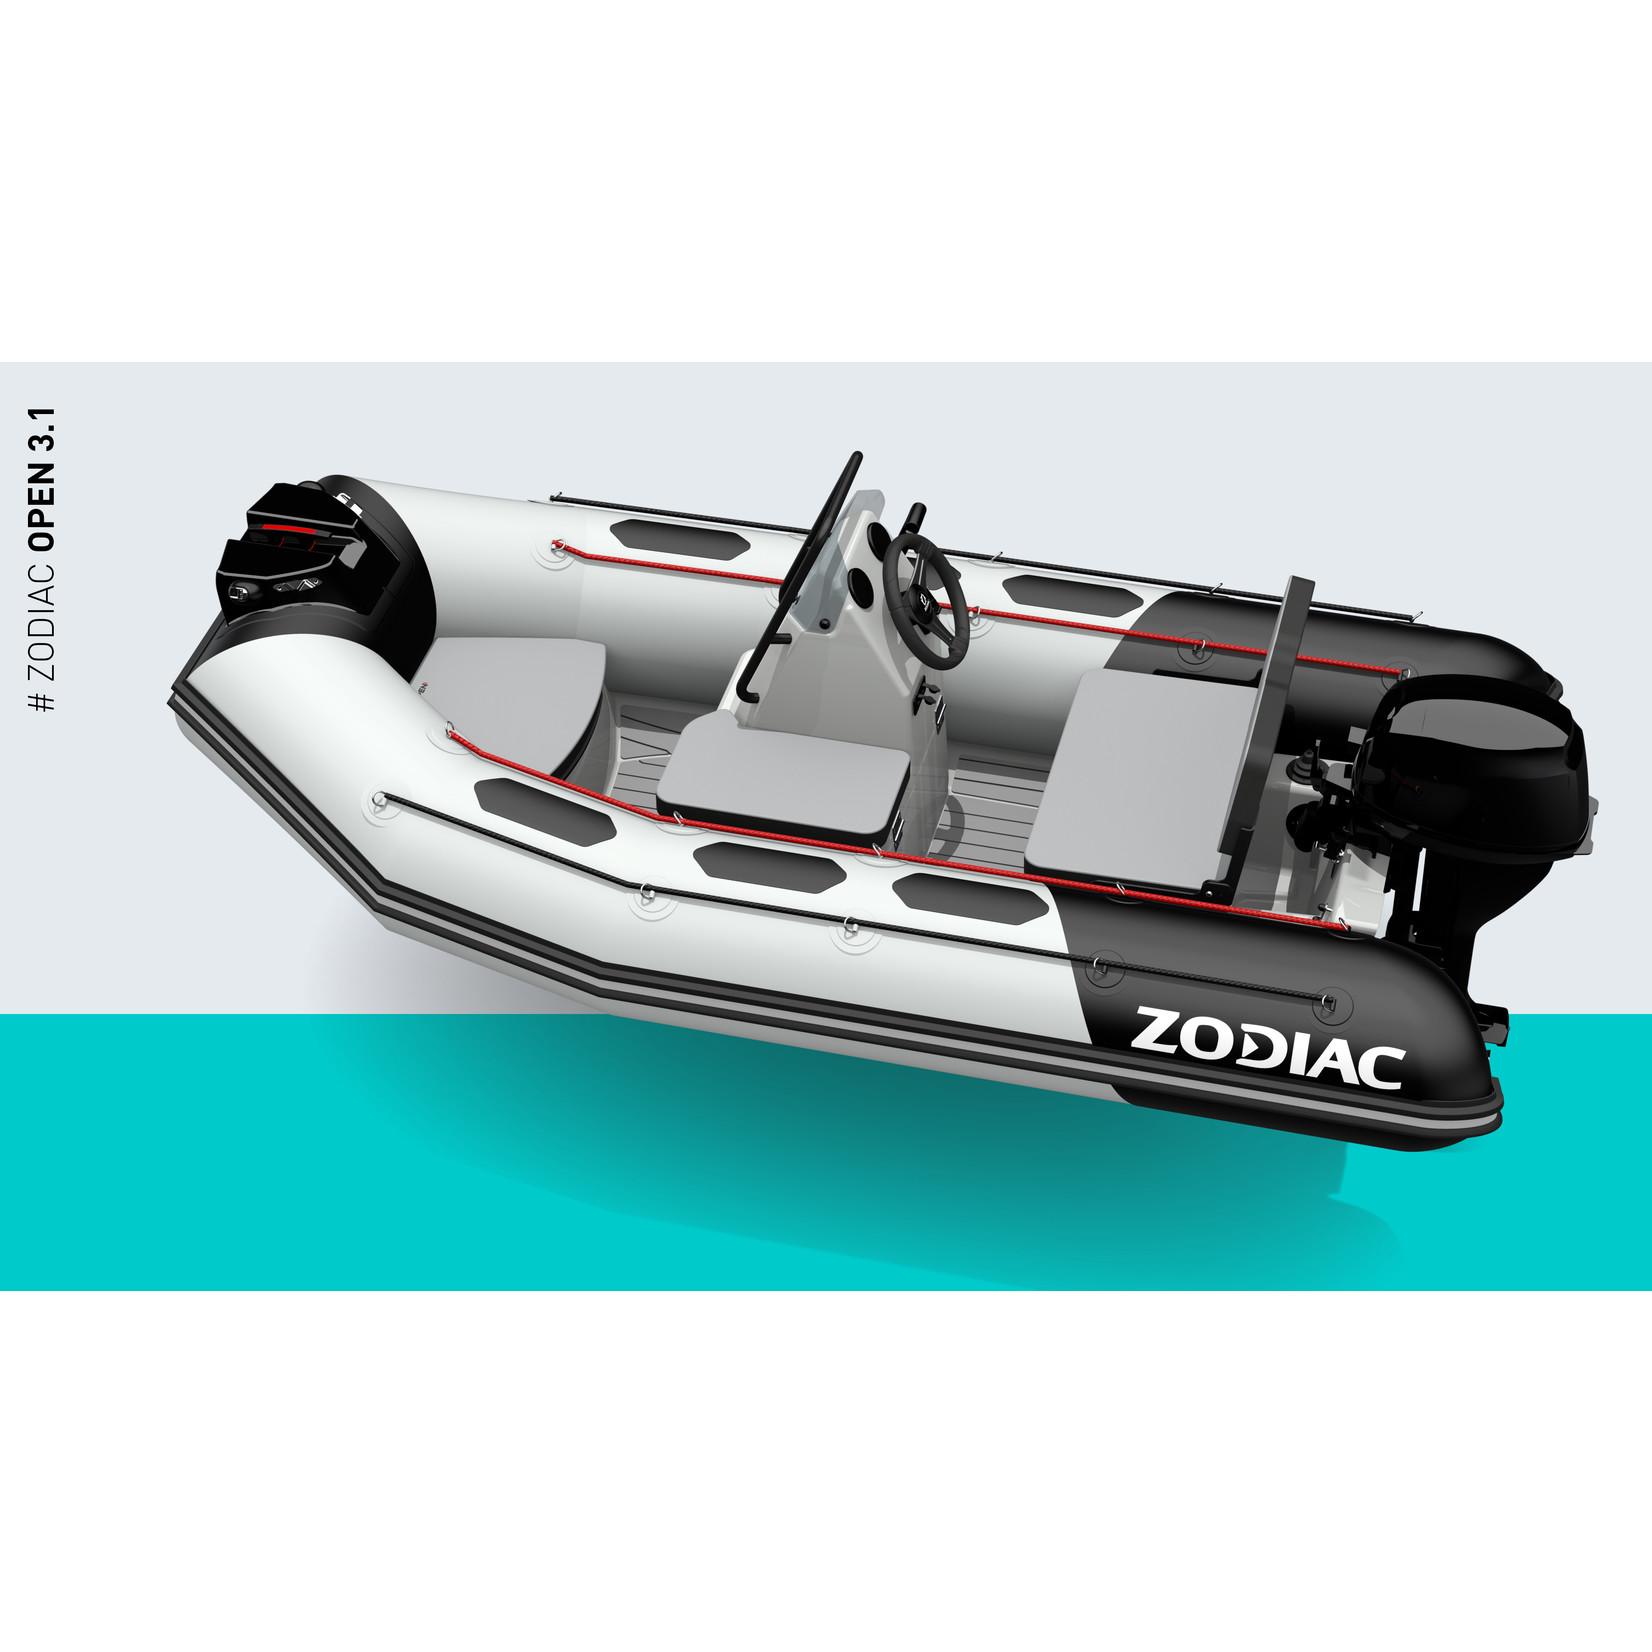 Zodiac OPEN 3.1 - PVC/Strongan drijver - romp in licht- of donkergrijs (3.10 mtr.)